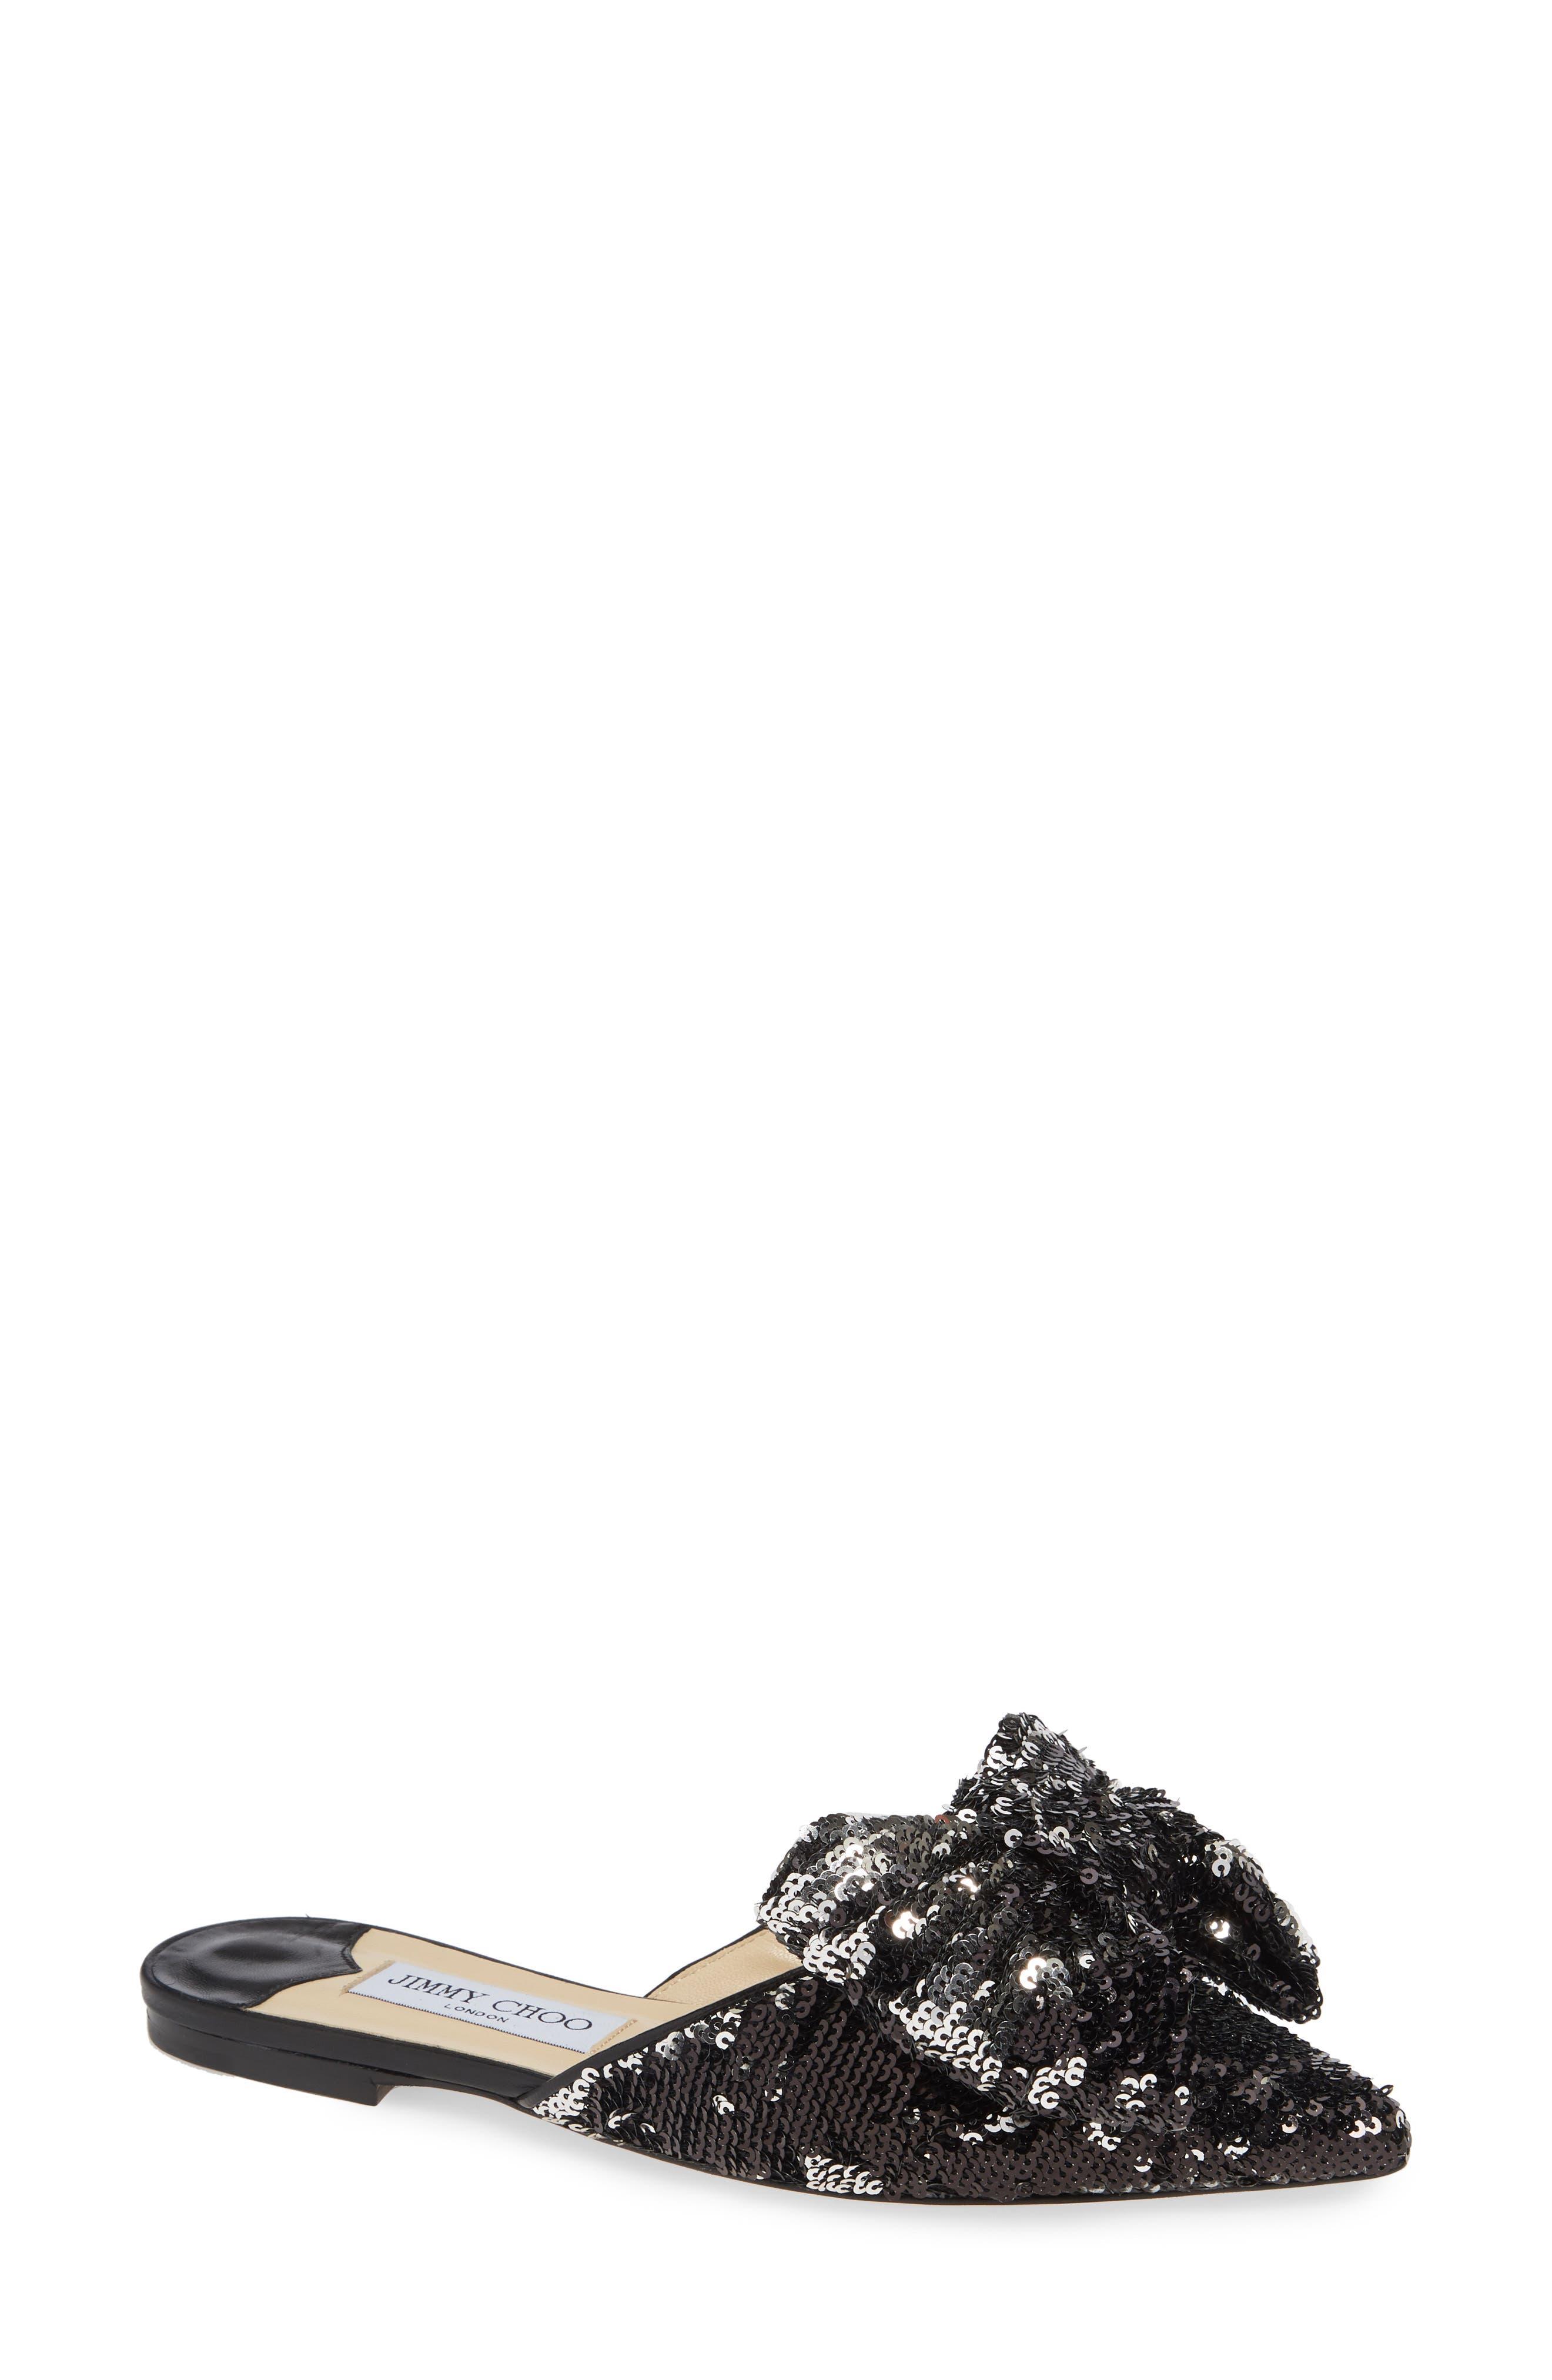 Georgia Sequin Bow Mule,                             Main thumbnail 1, color,                             BLACK/ SILVER